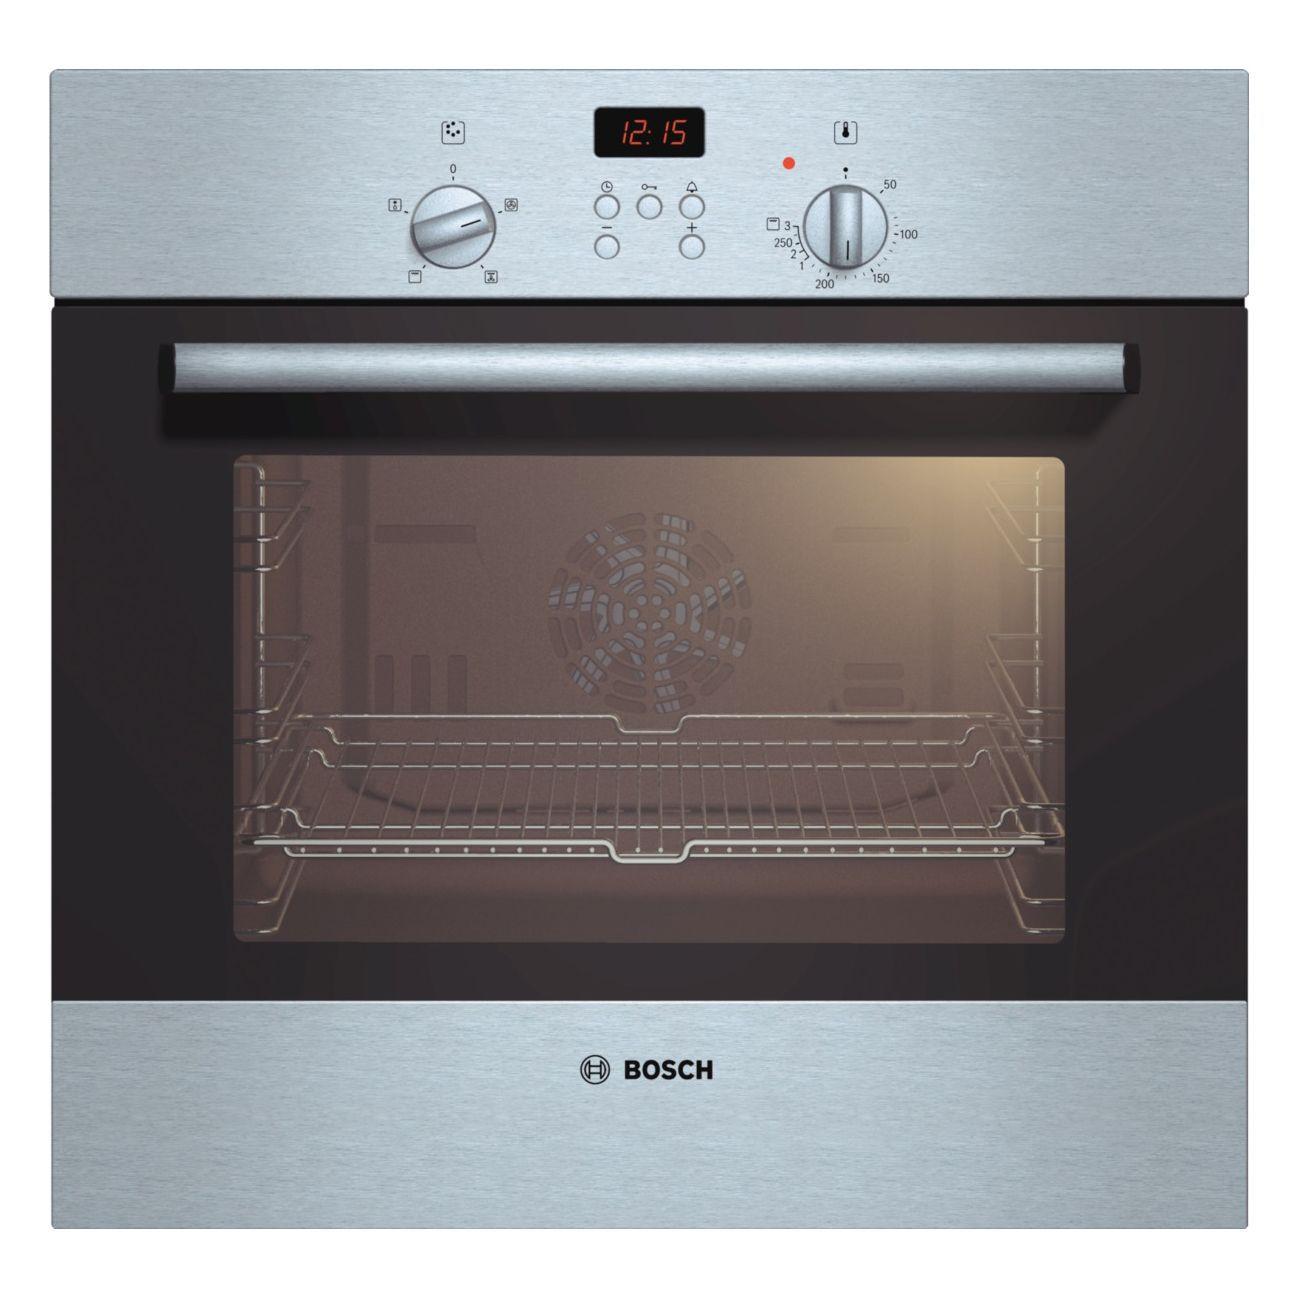 Bosch Hbn331e2b Silver Electric Single Oven Departments